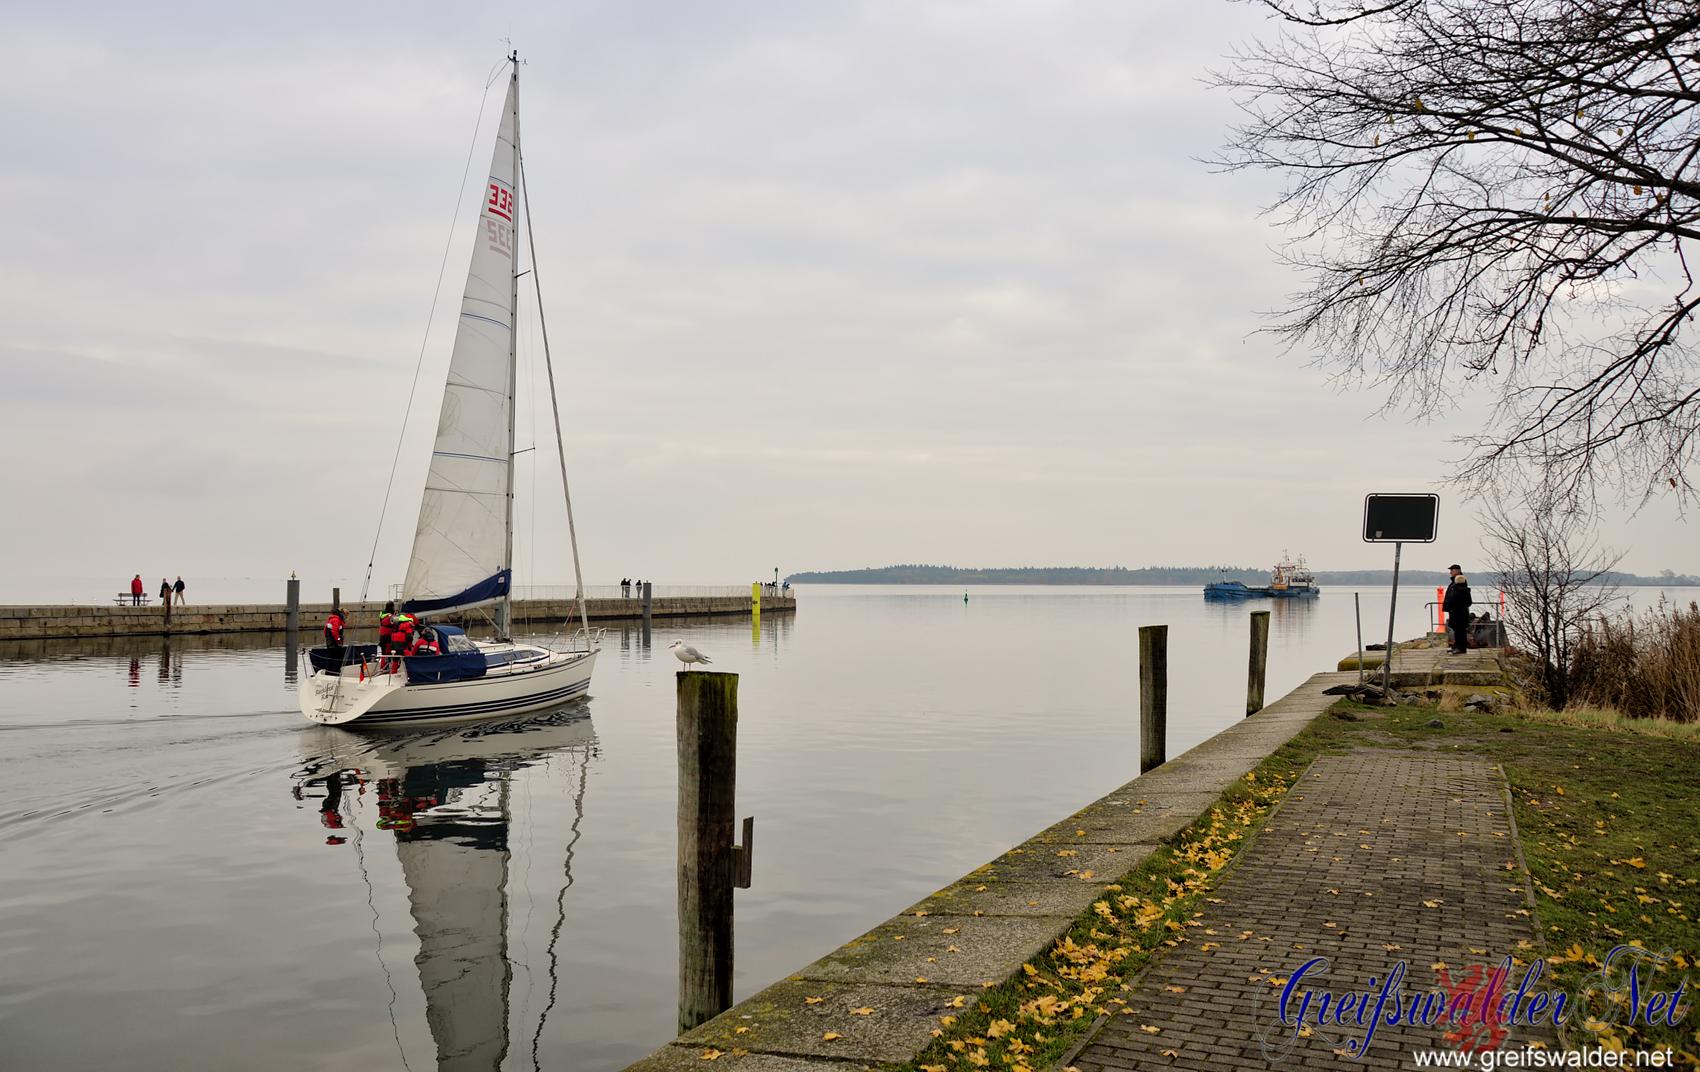 Grauer November-Sonntag an der Mole in Greifswald-Wieck